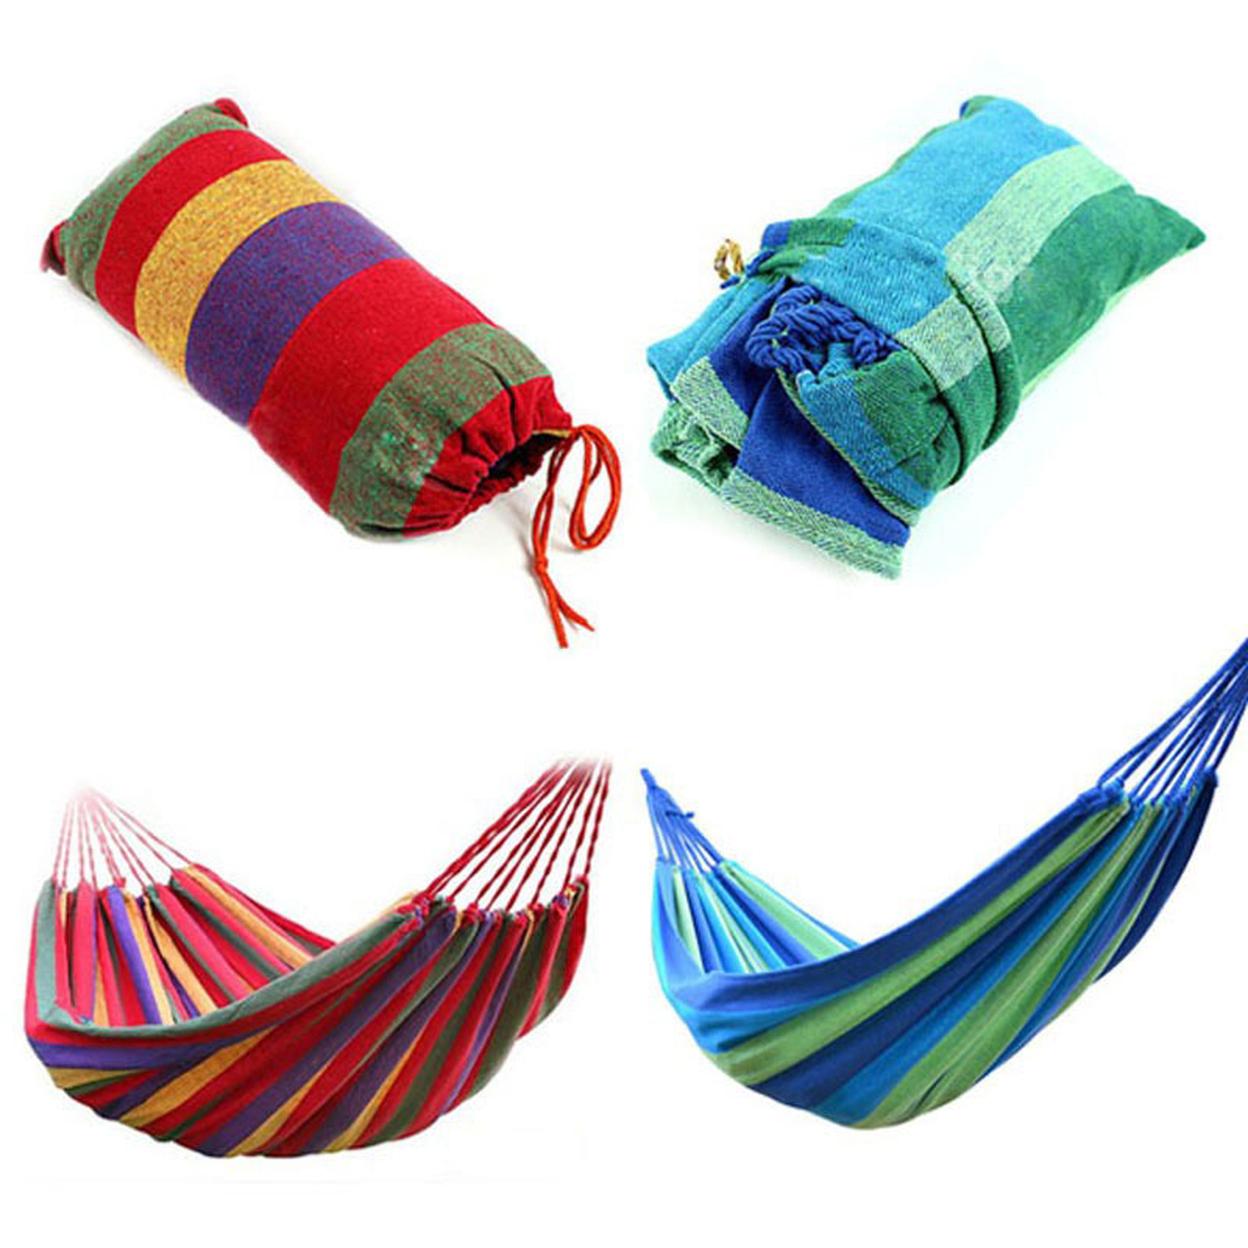 Outdoor Travel Hammock in 2 Colors - Blue Stripes 58b86dd4c915e42a761bba5b